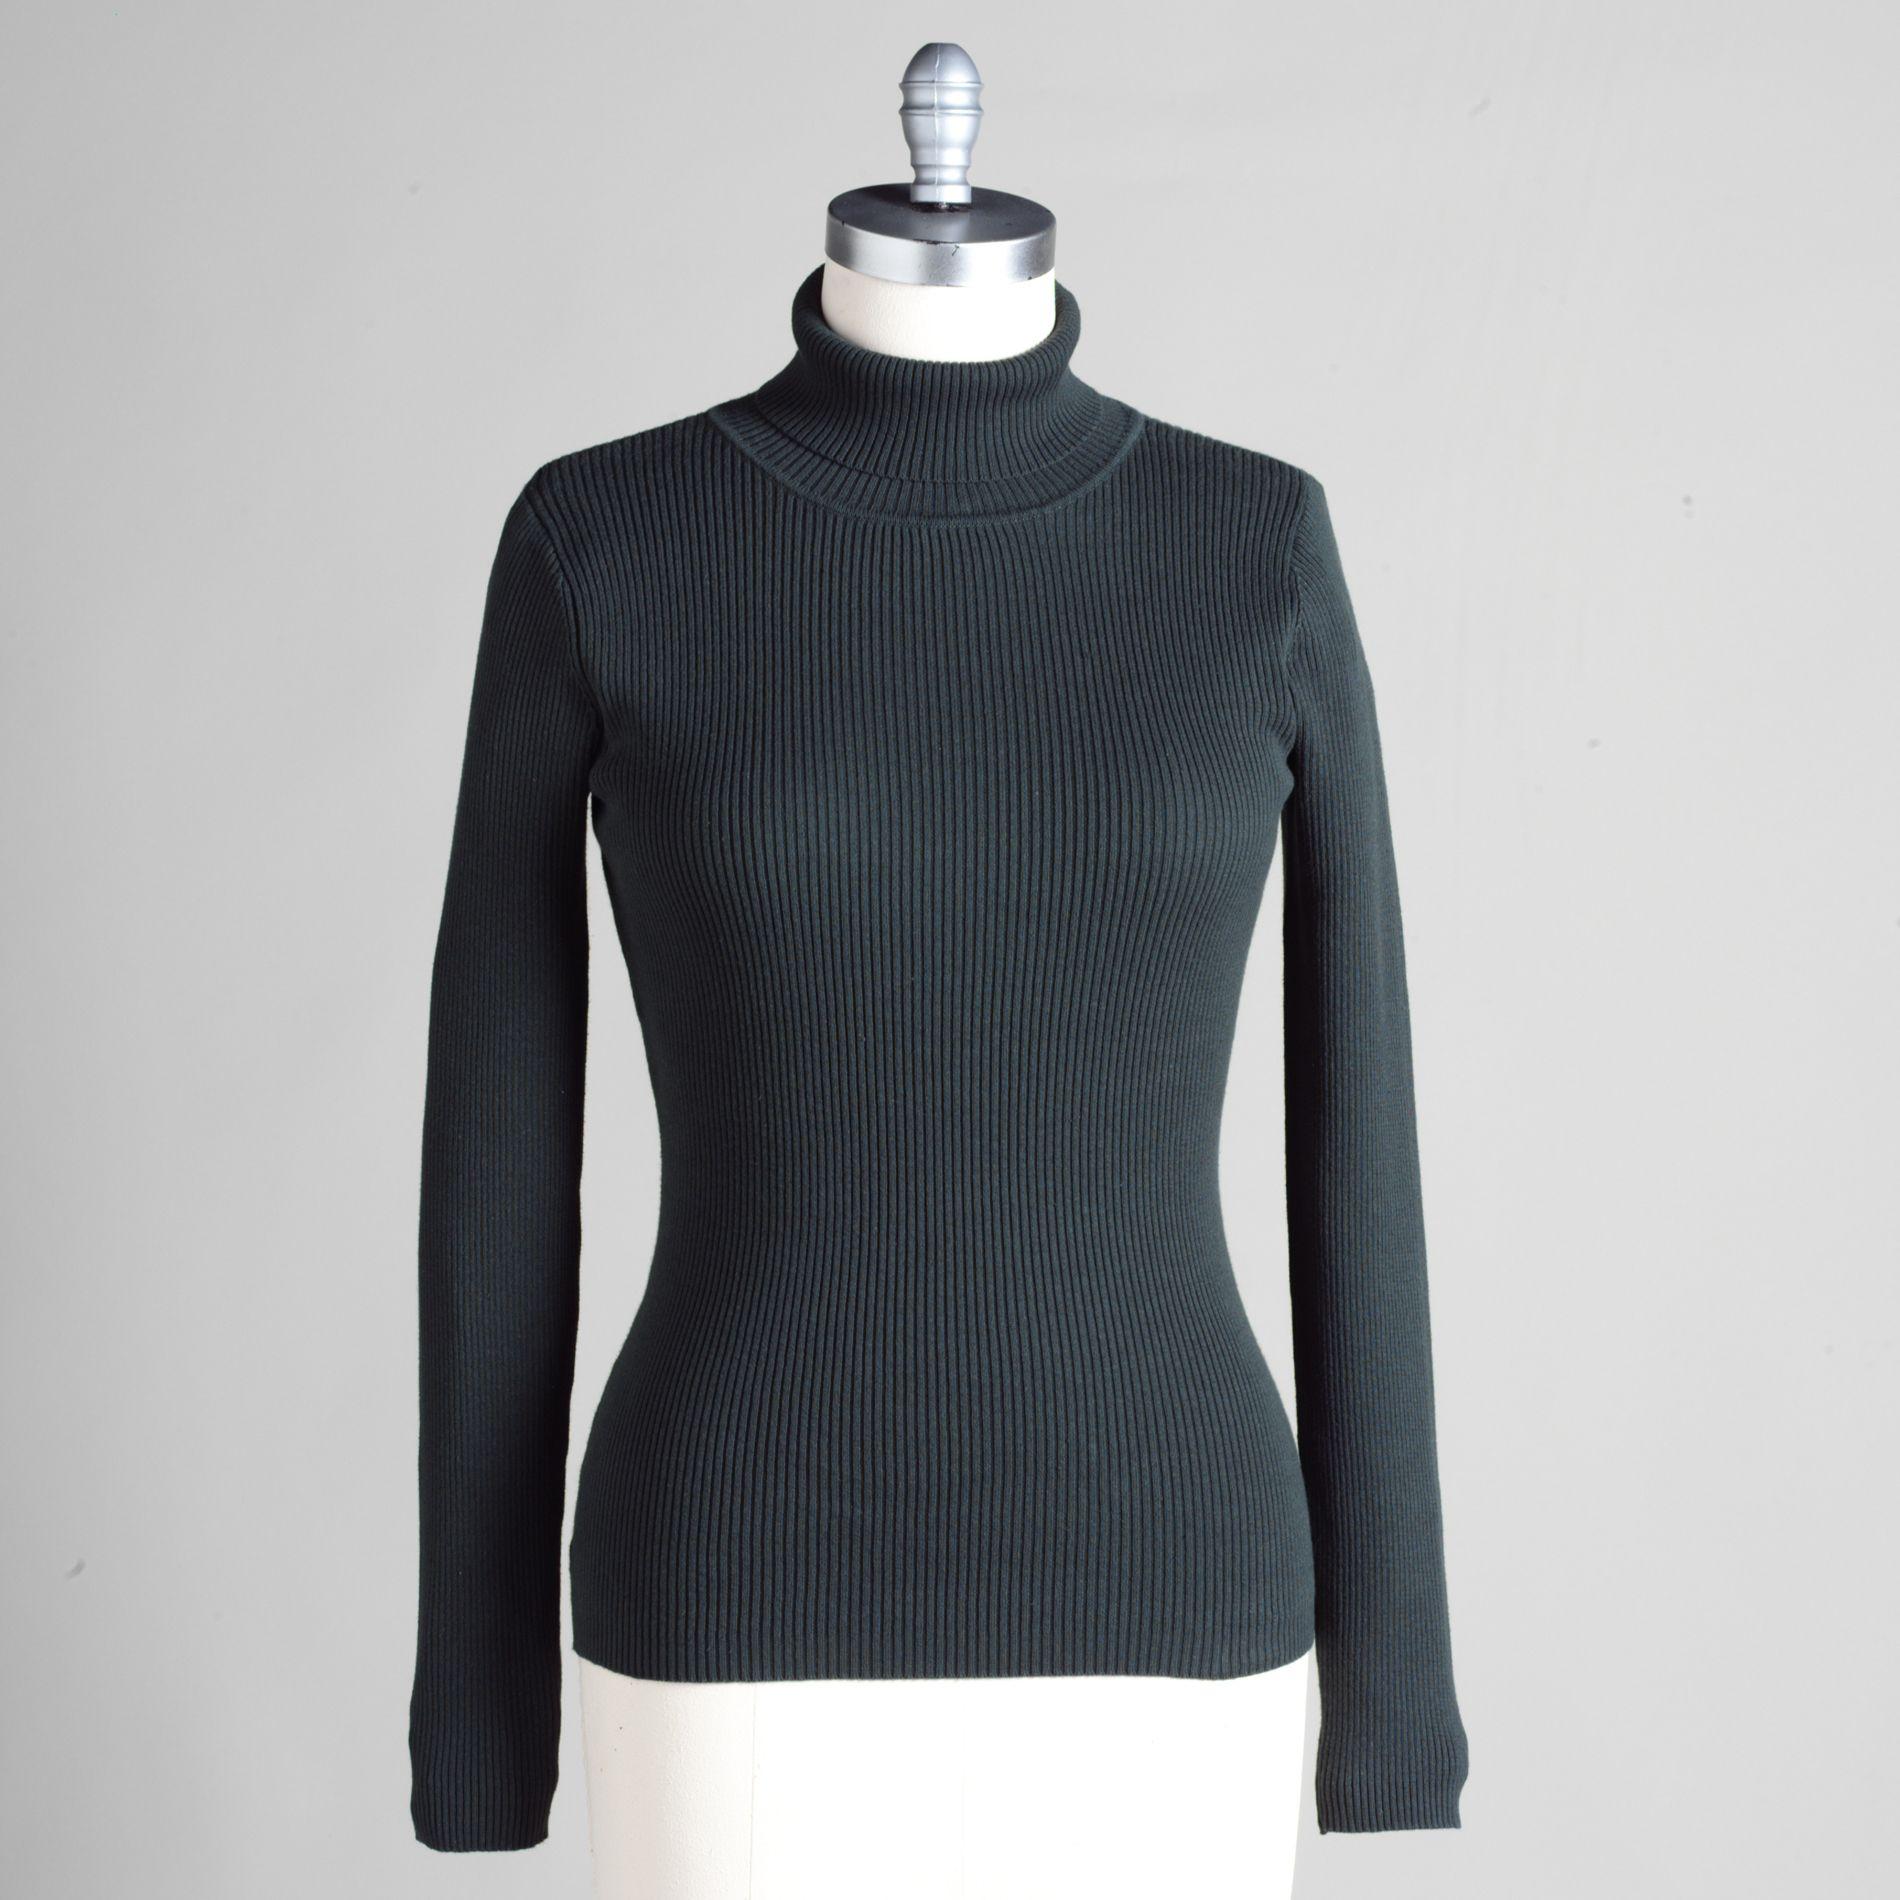 Basic Editions Women' 100 Cotton Turtleneck Rib Solid Sweater